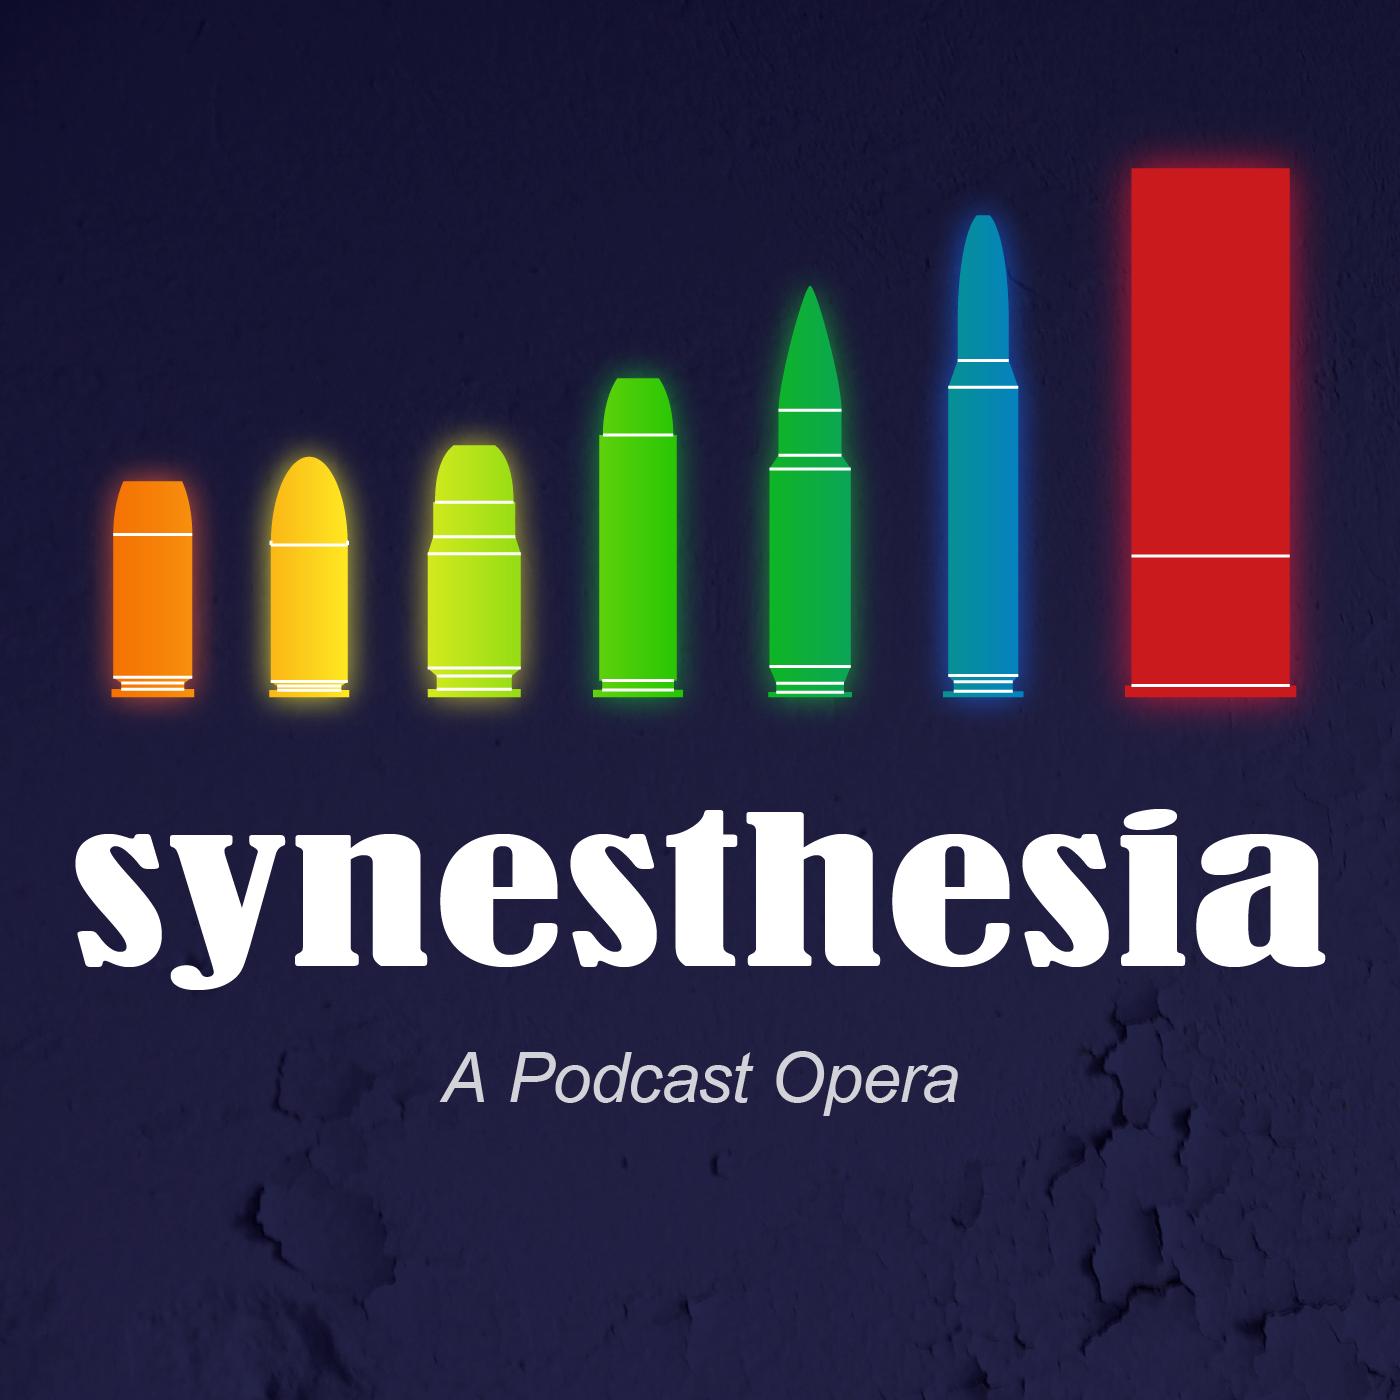 The Podcast Opera